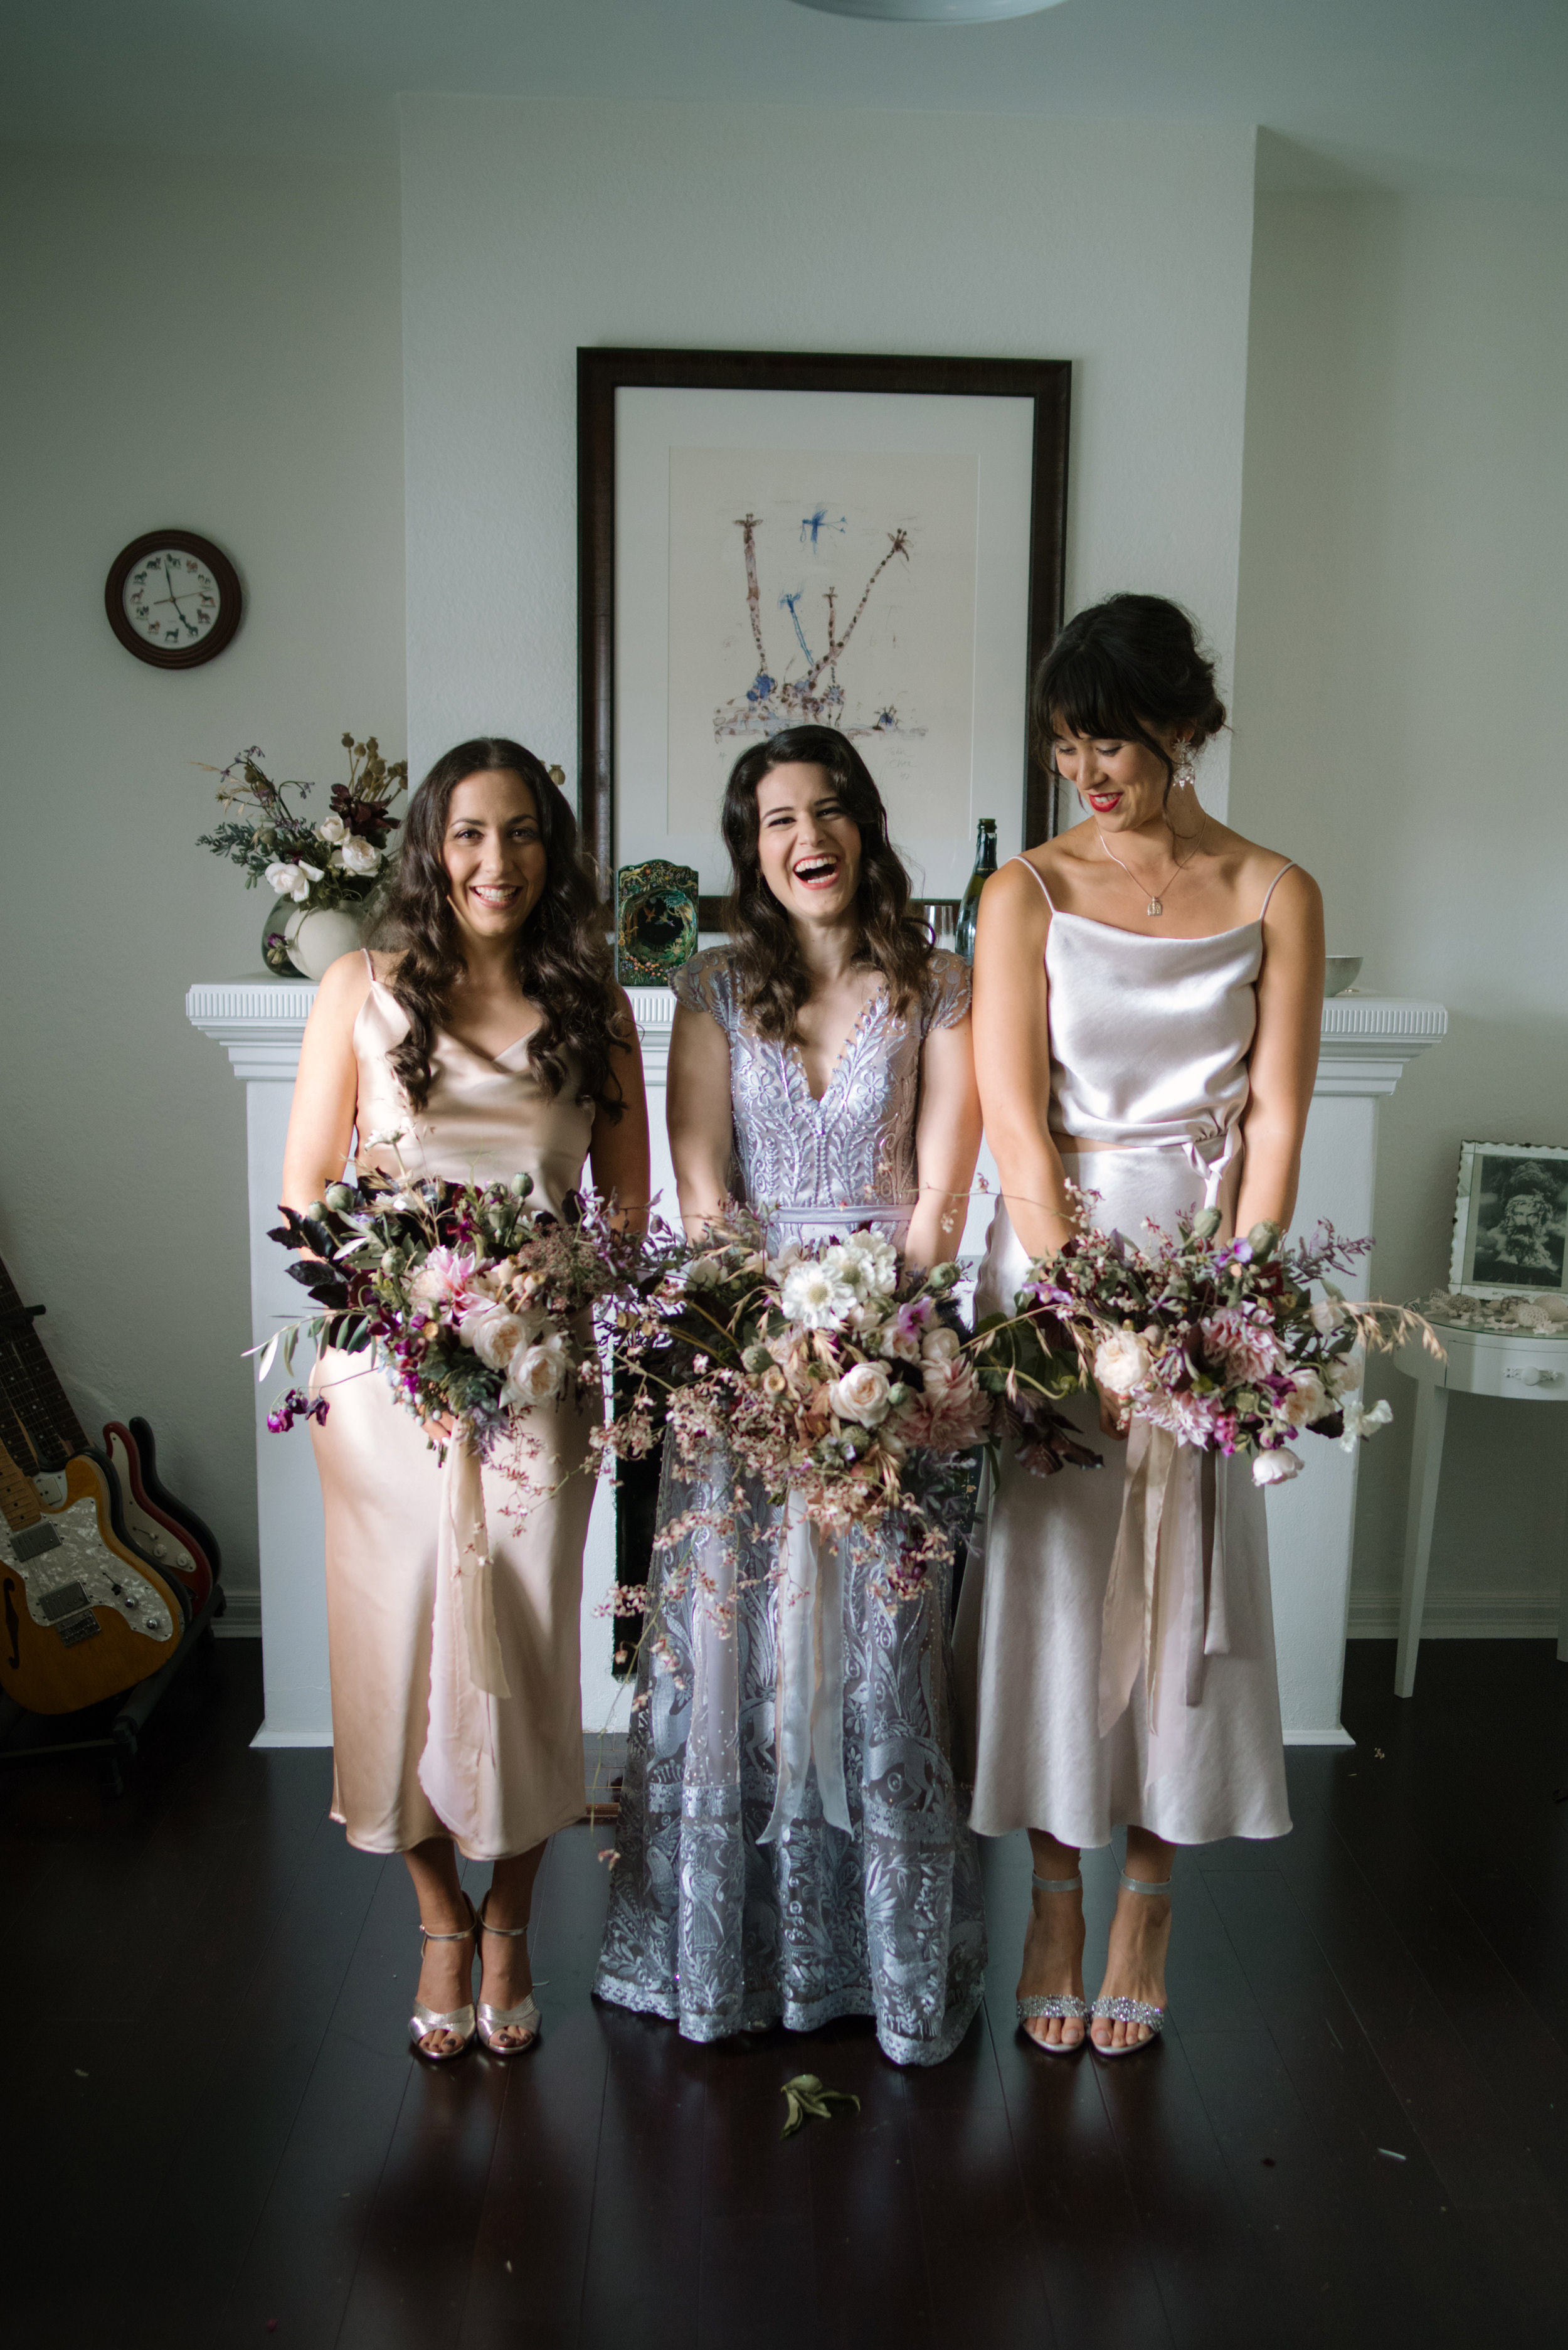 I-Got-You-Babe-&.Co.-Glasshaus-Wedding-Charlotte-Cameron0033.JPG